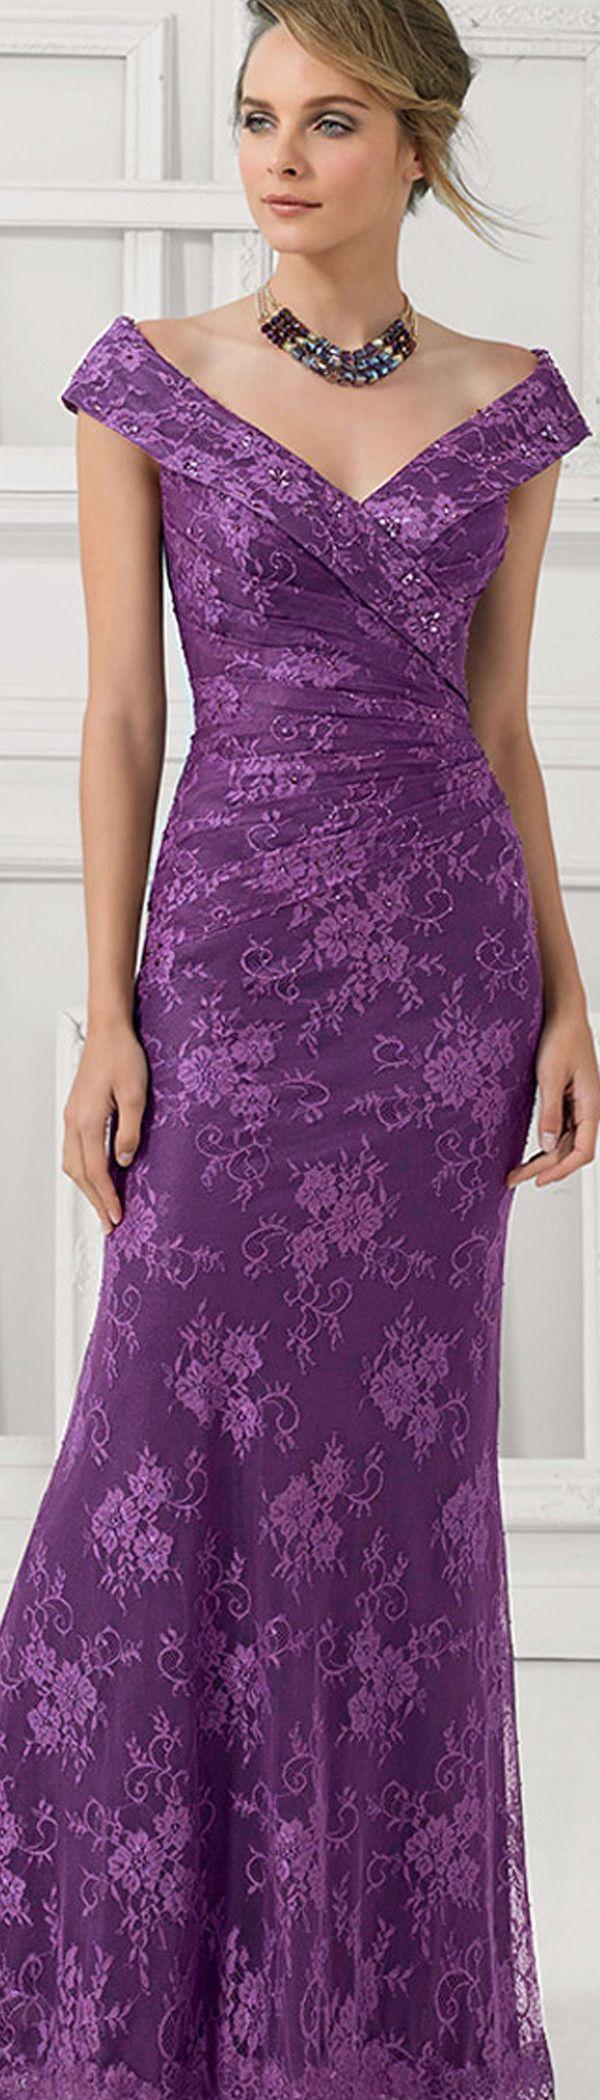 374 best ملابس سهره و سواريه images on Pinterest | Cute dresses ...